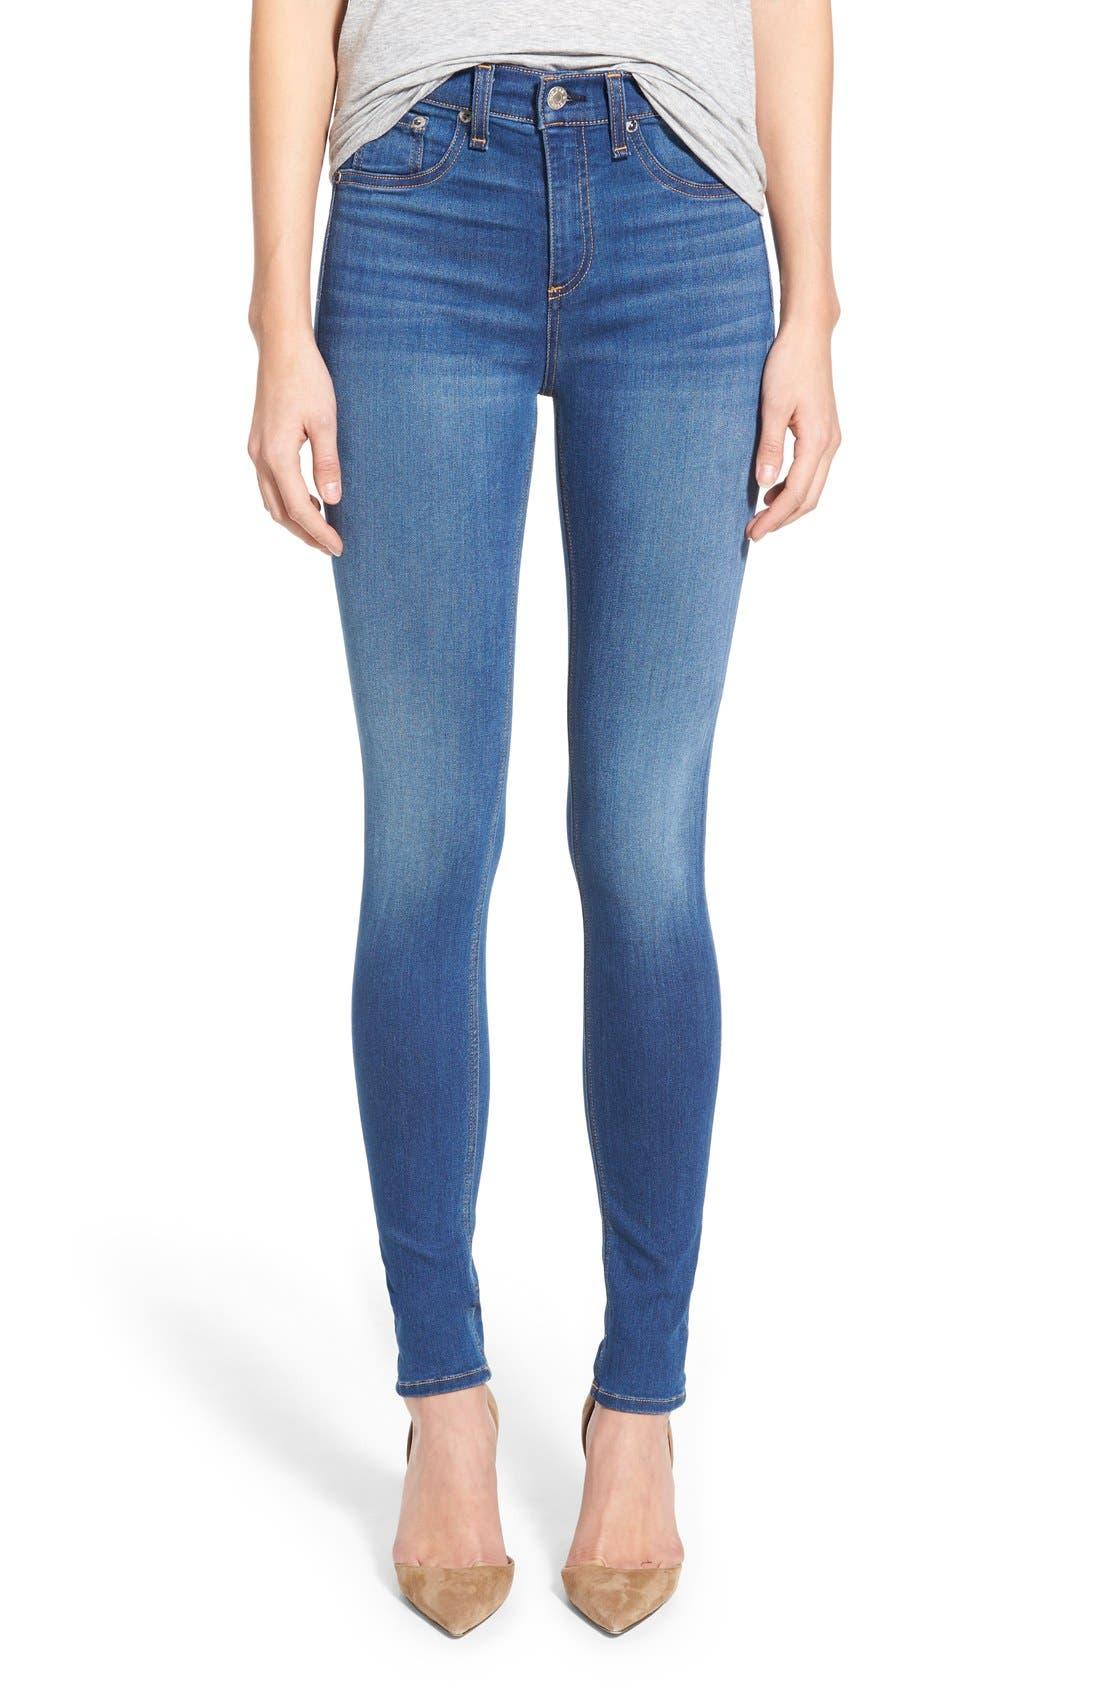 Alternate Image 1 Selected - rag & bone/JEAN High Rise Skinny Jeans (Houston)